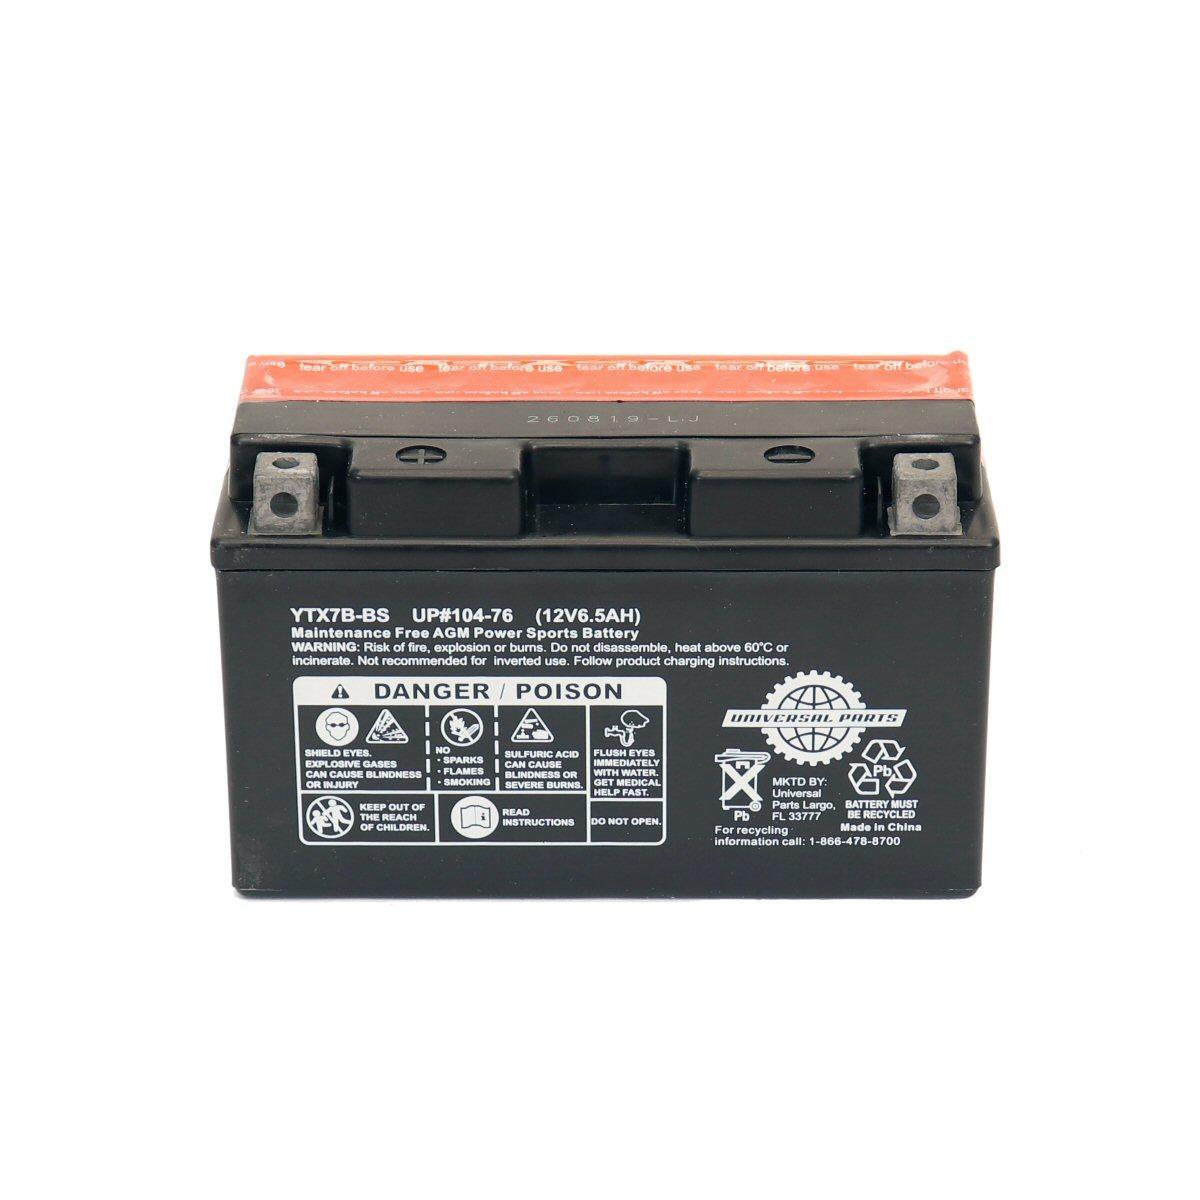 Universal Parts 12 Volt 6.5 Amp YTX7B-BS Battery